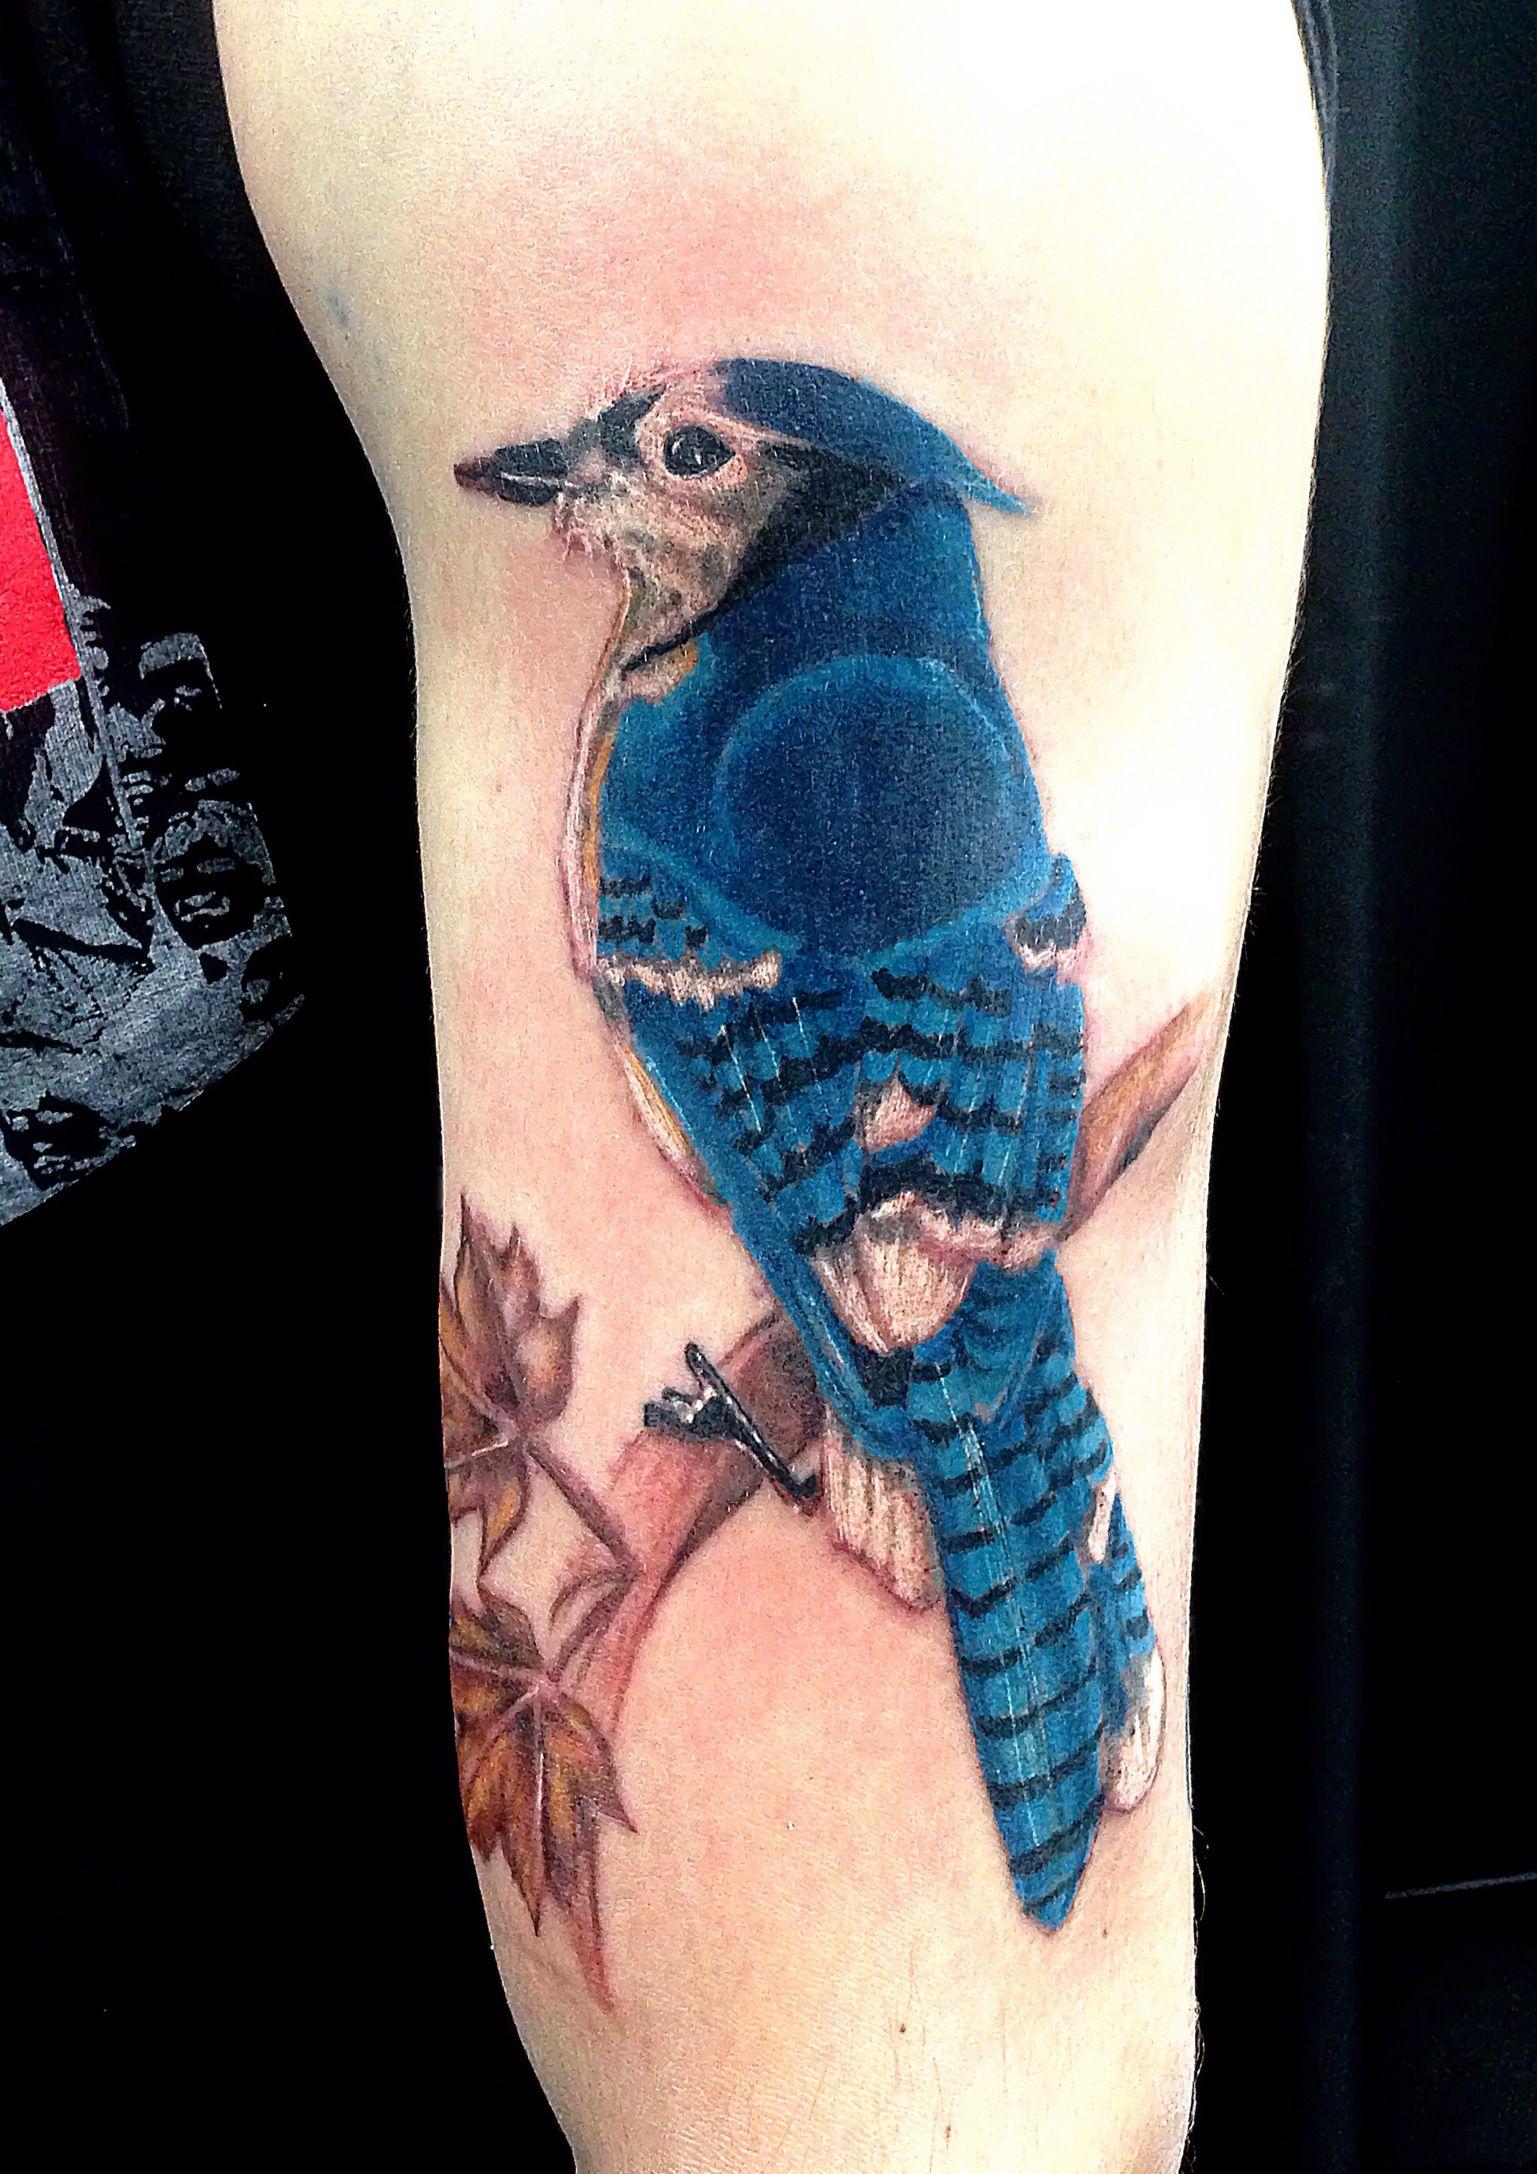 Bluejay tattoo Blacky's Tattoo Studio...Done by Blacky